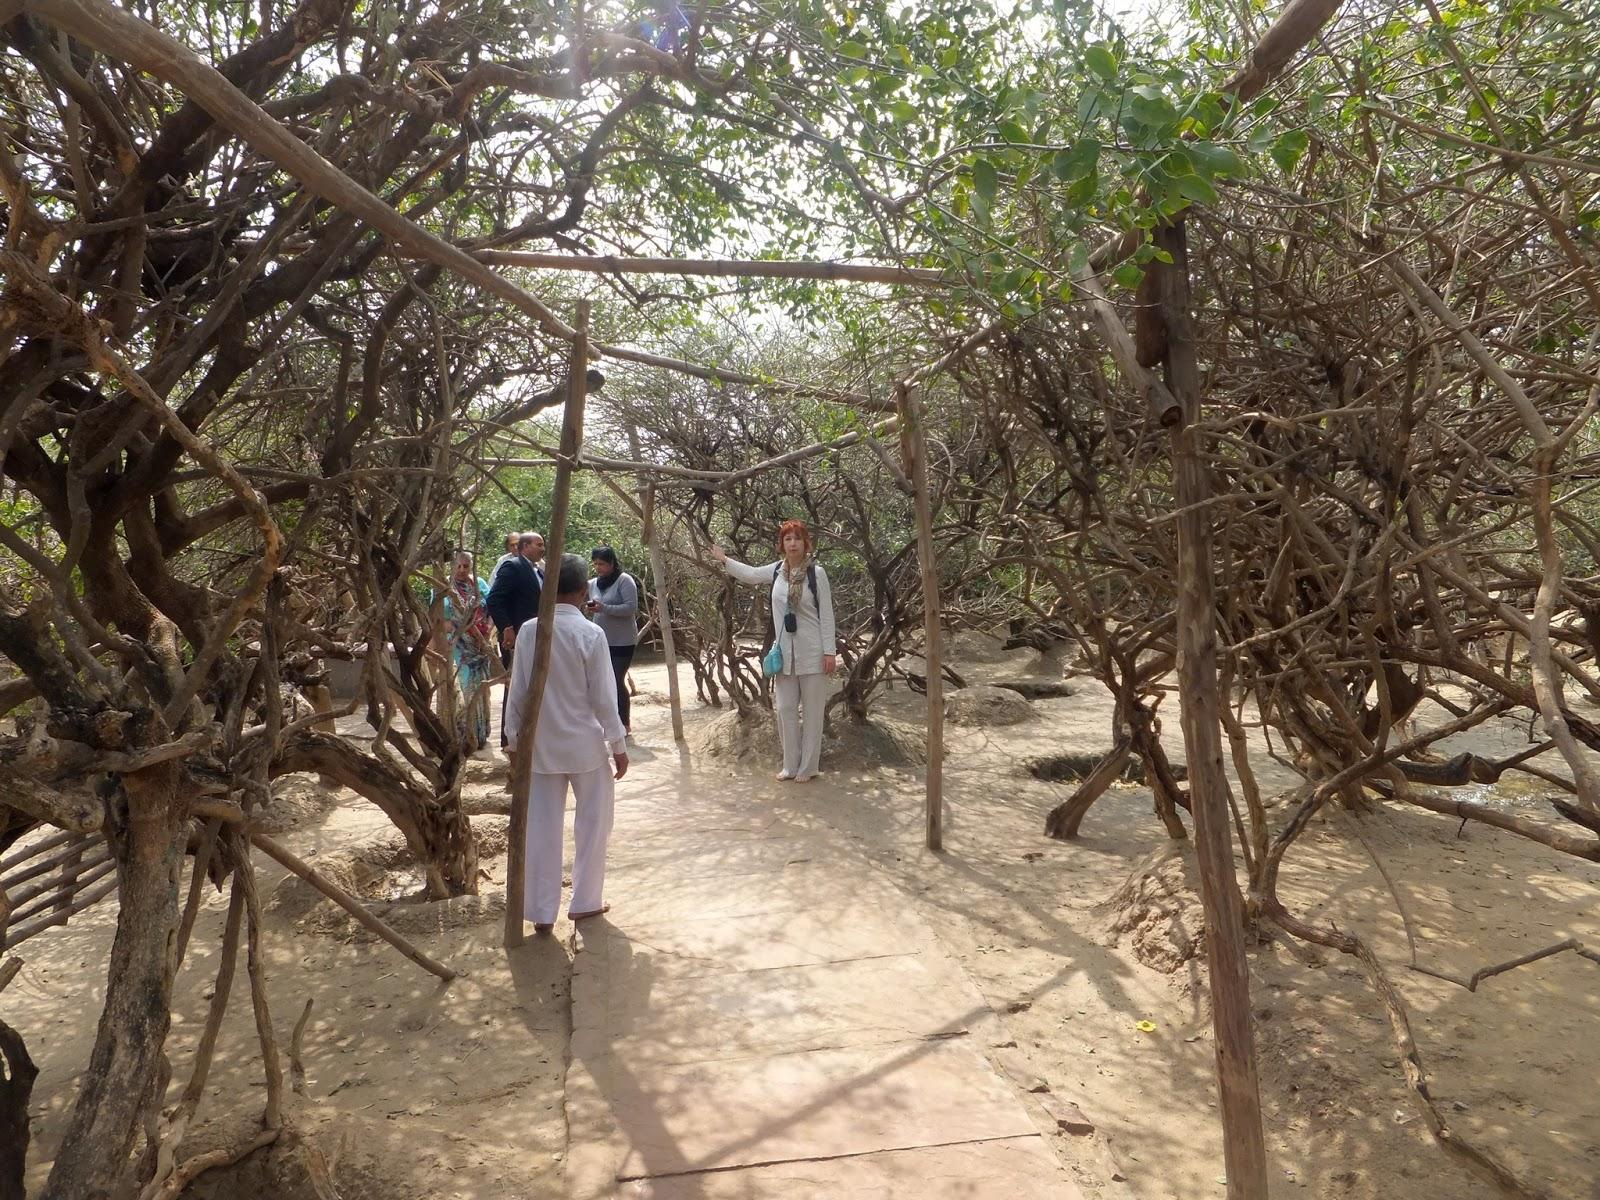 храм-сад в Индии